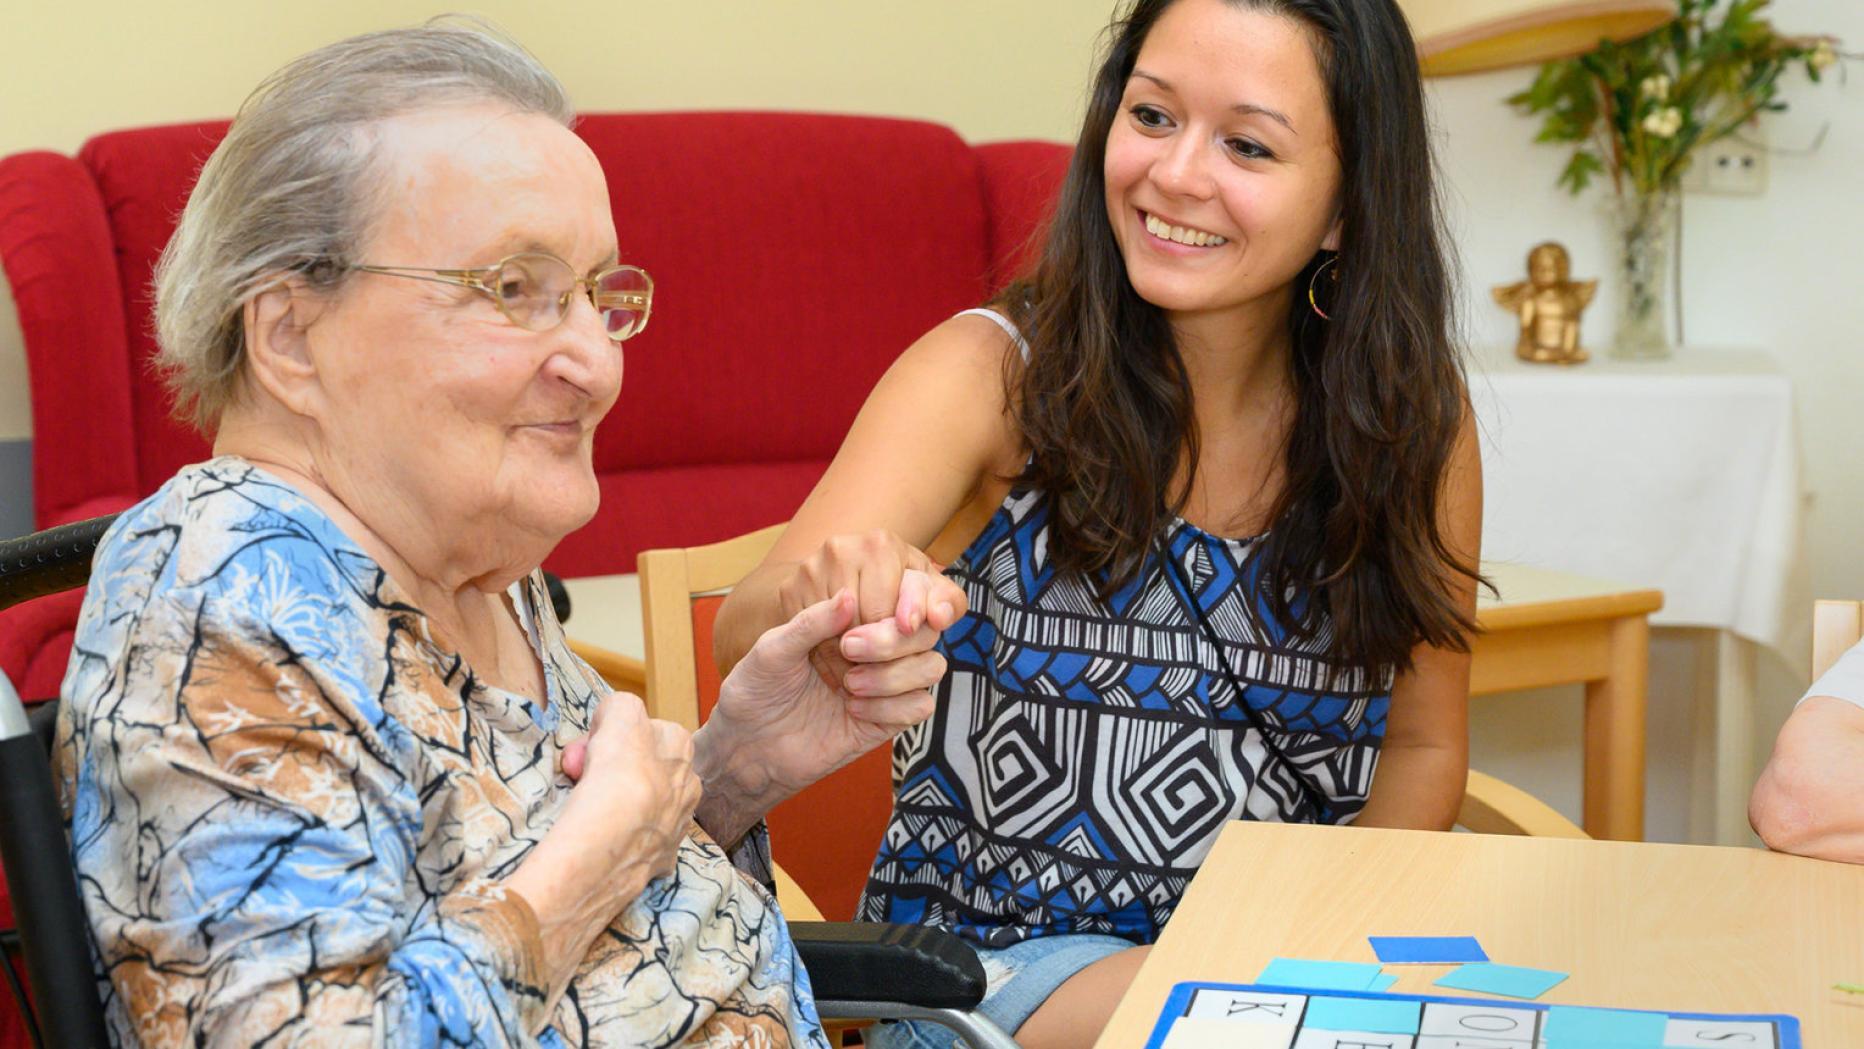 Partnersuche Fr Senioren Marchegg, Christliche